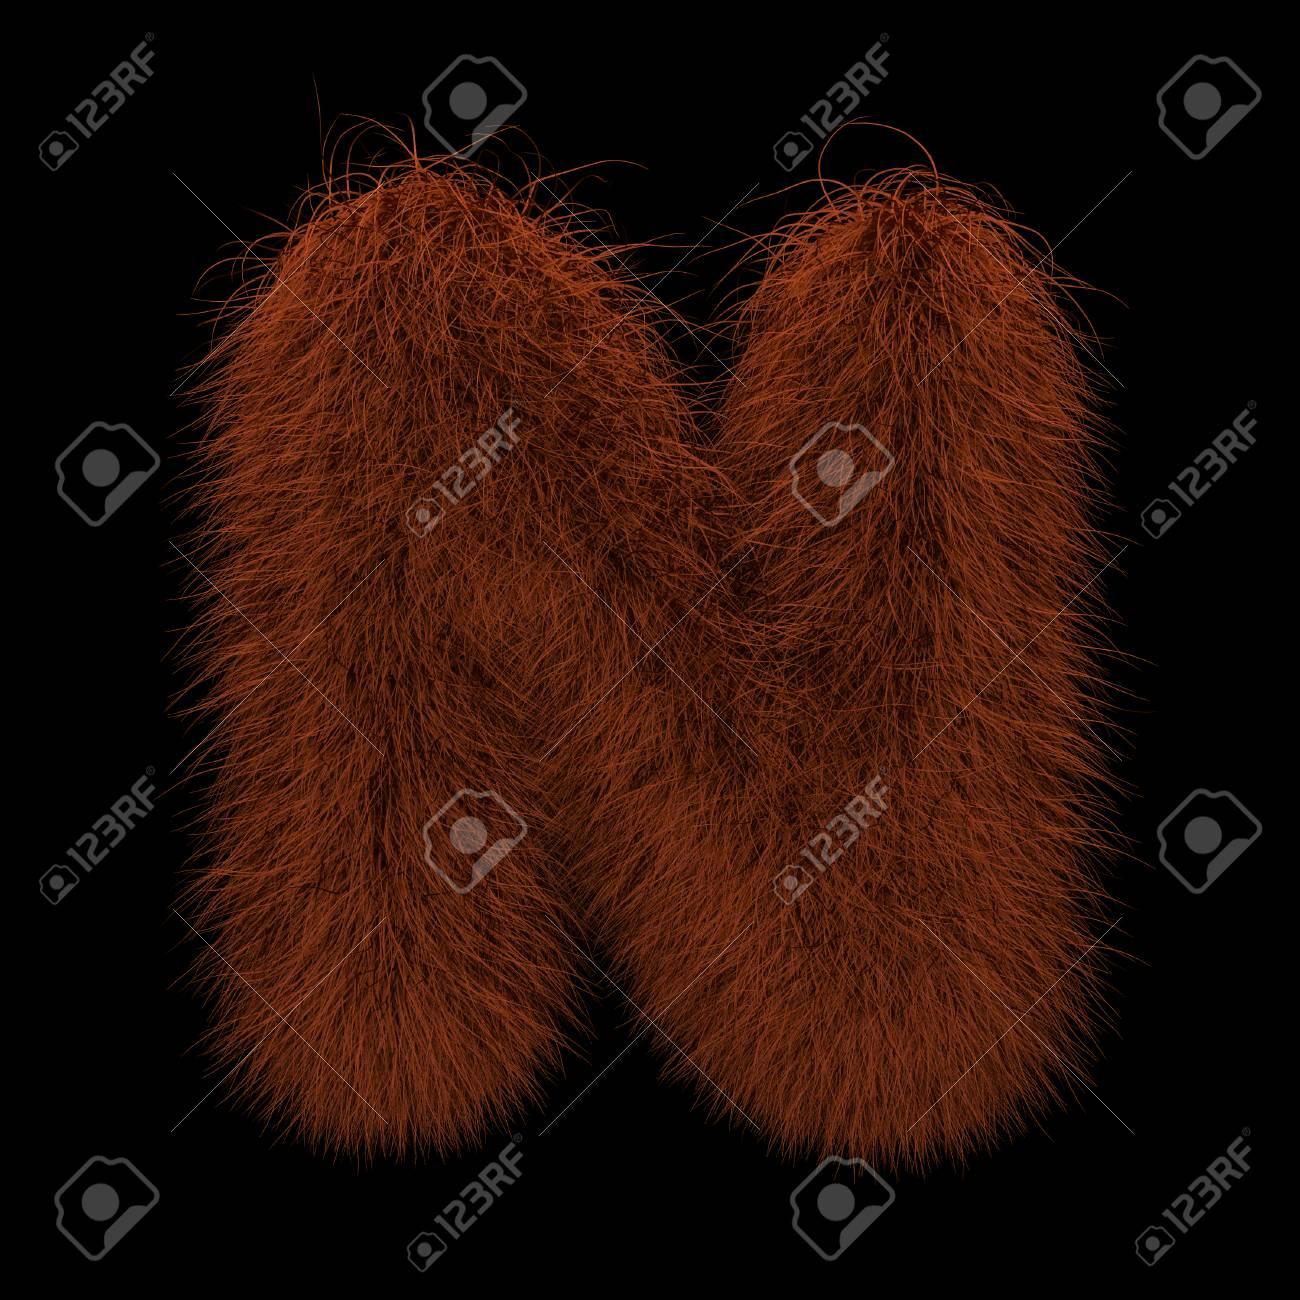 free-art-hairy-redhead